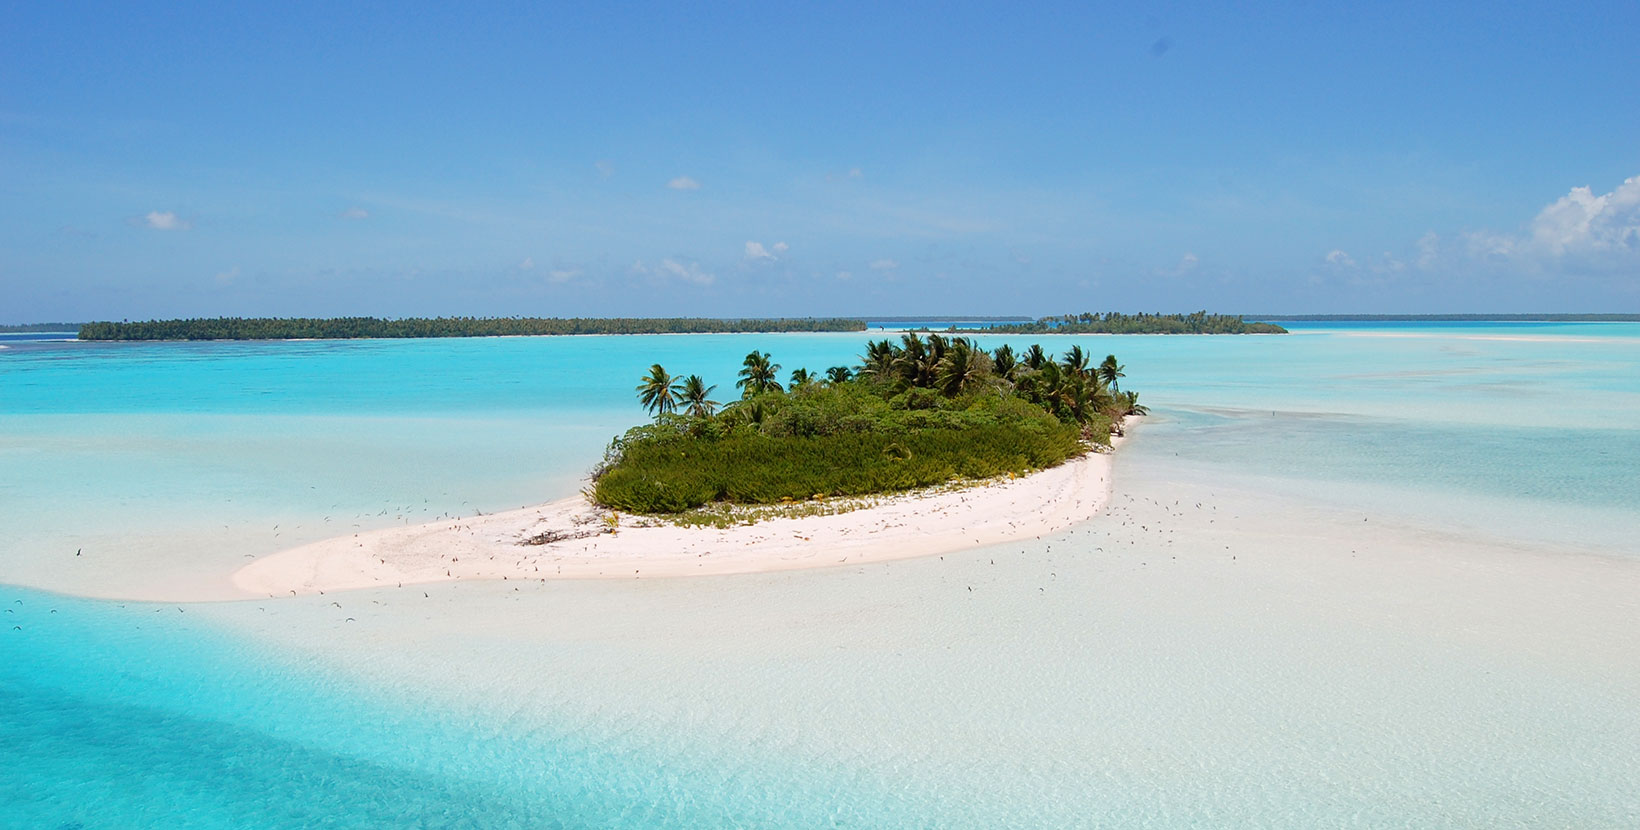 tetiaroa-island-7.jpg